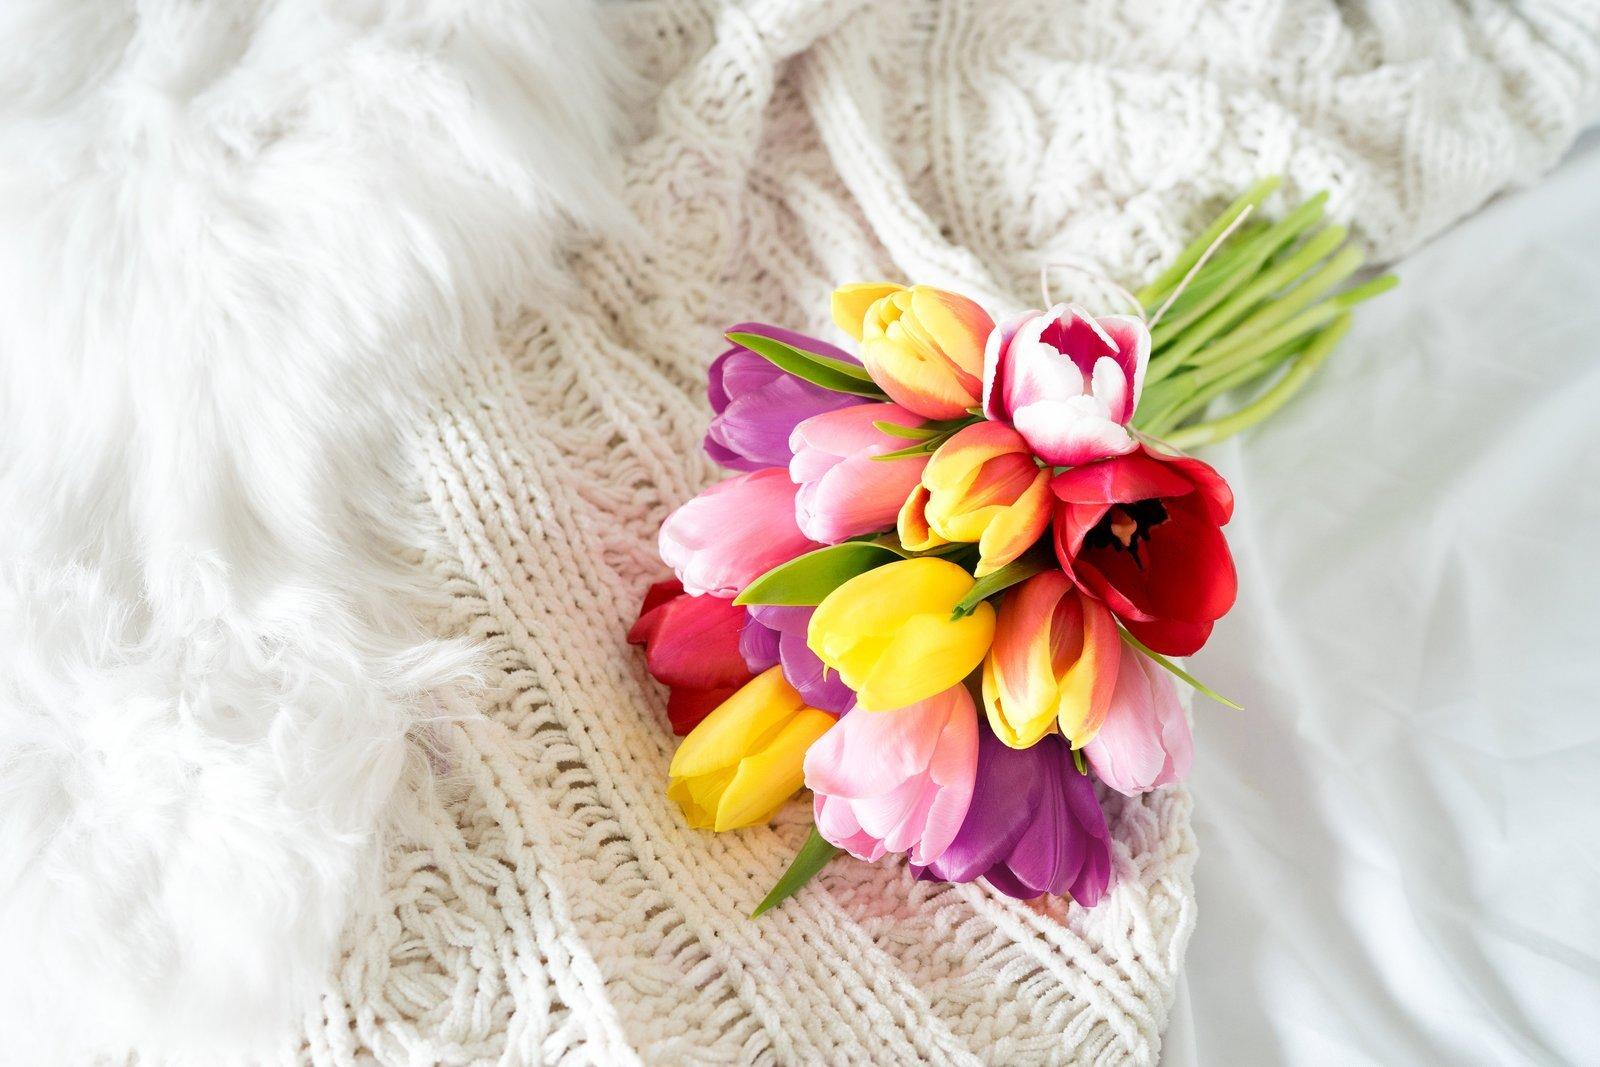 Flowers-Rainbow-Tulip-Bouquet-15-Stems